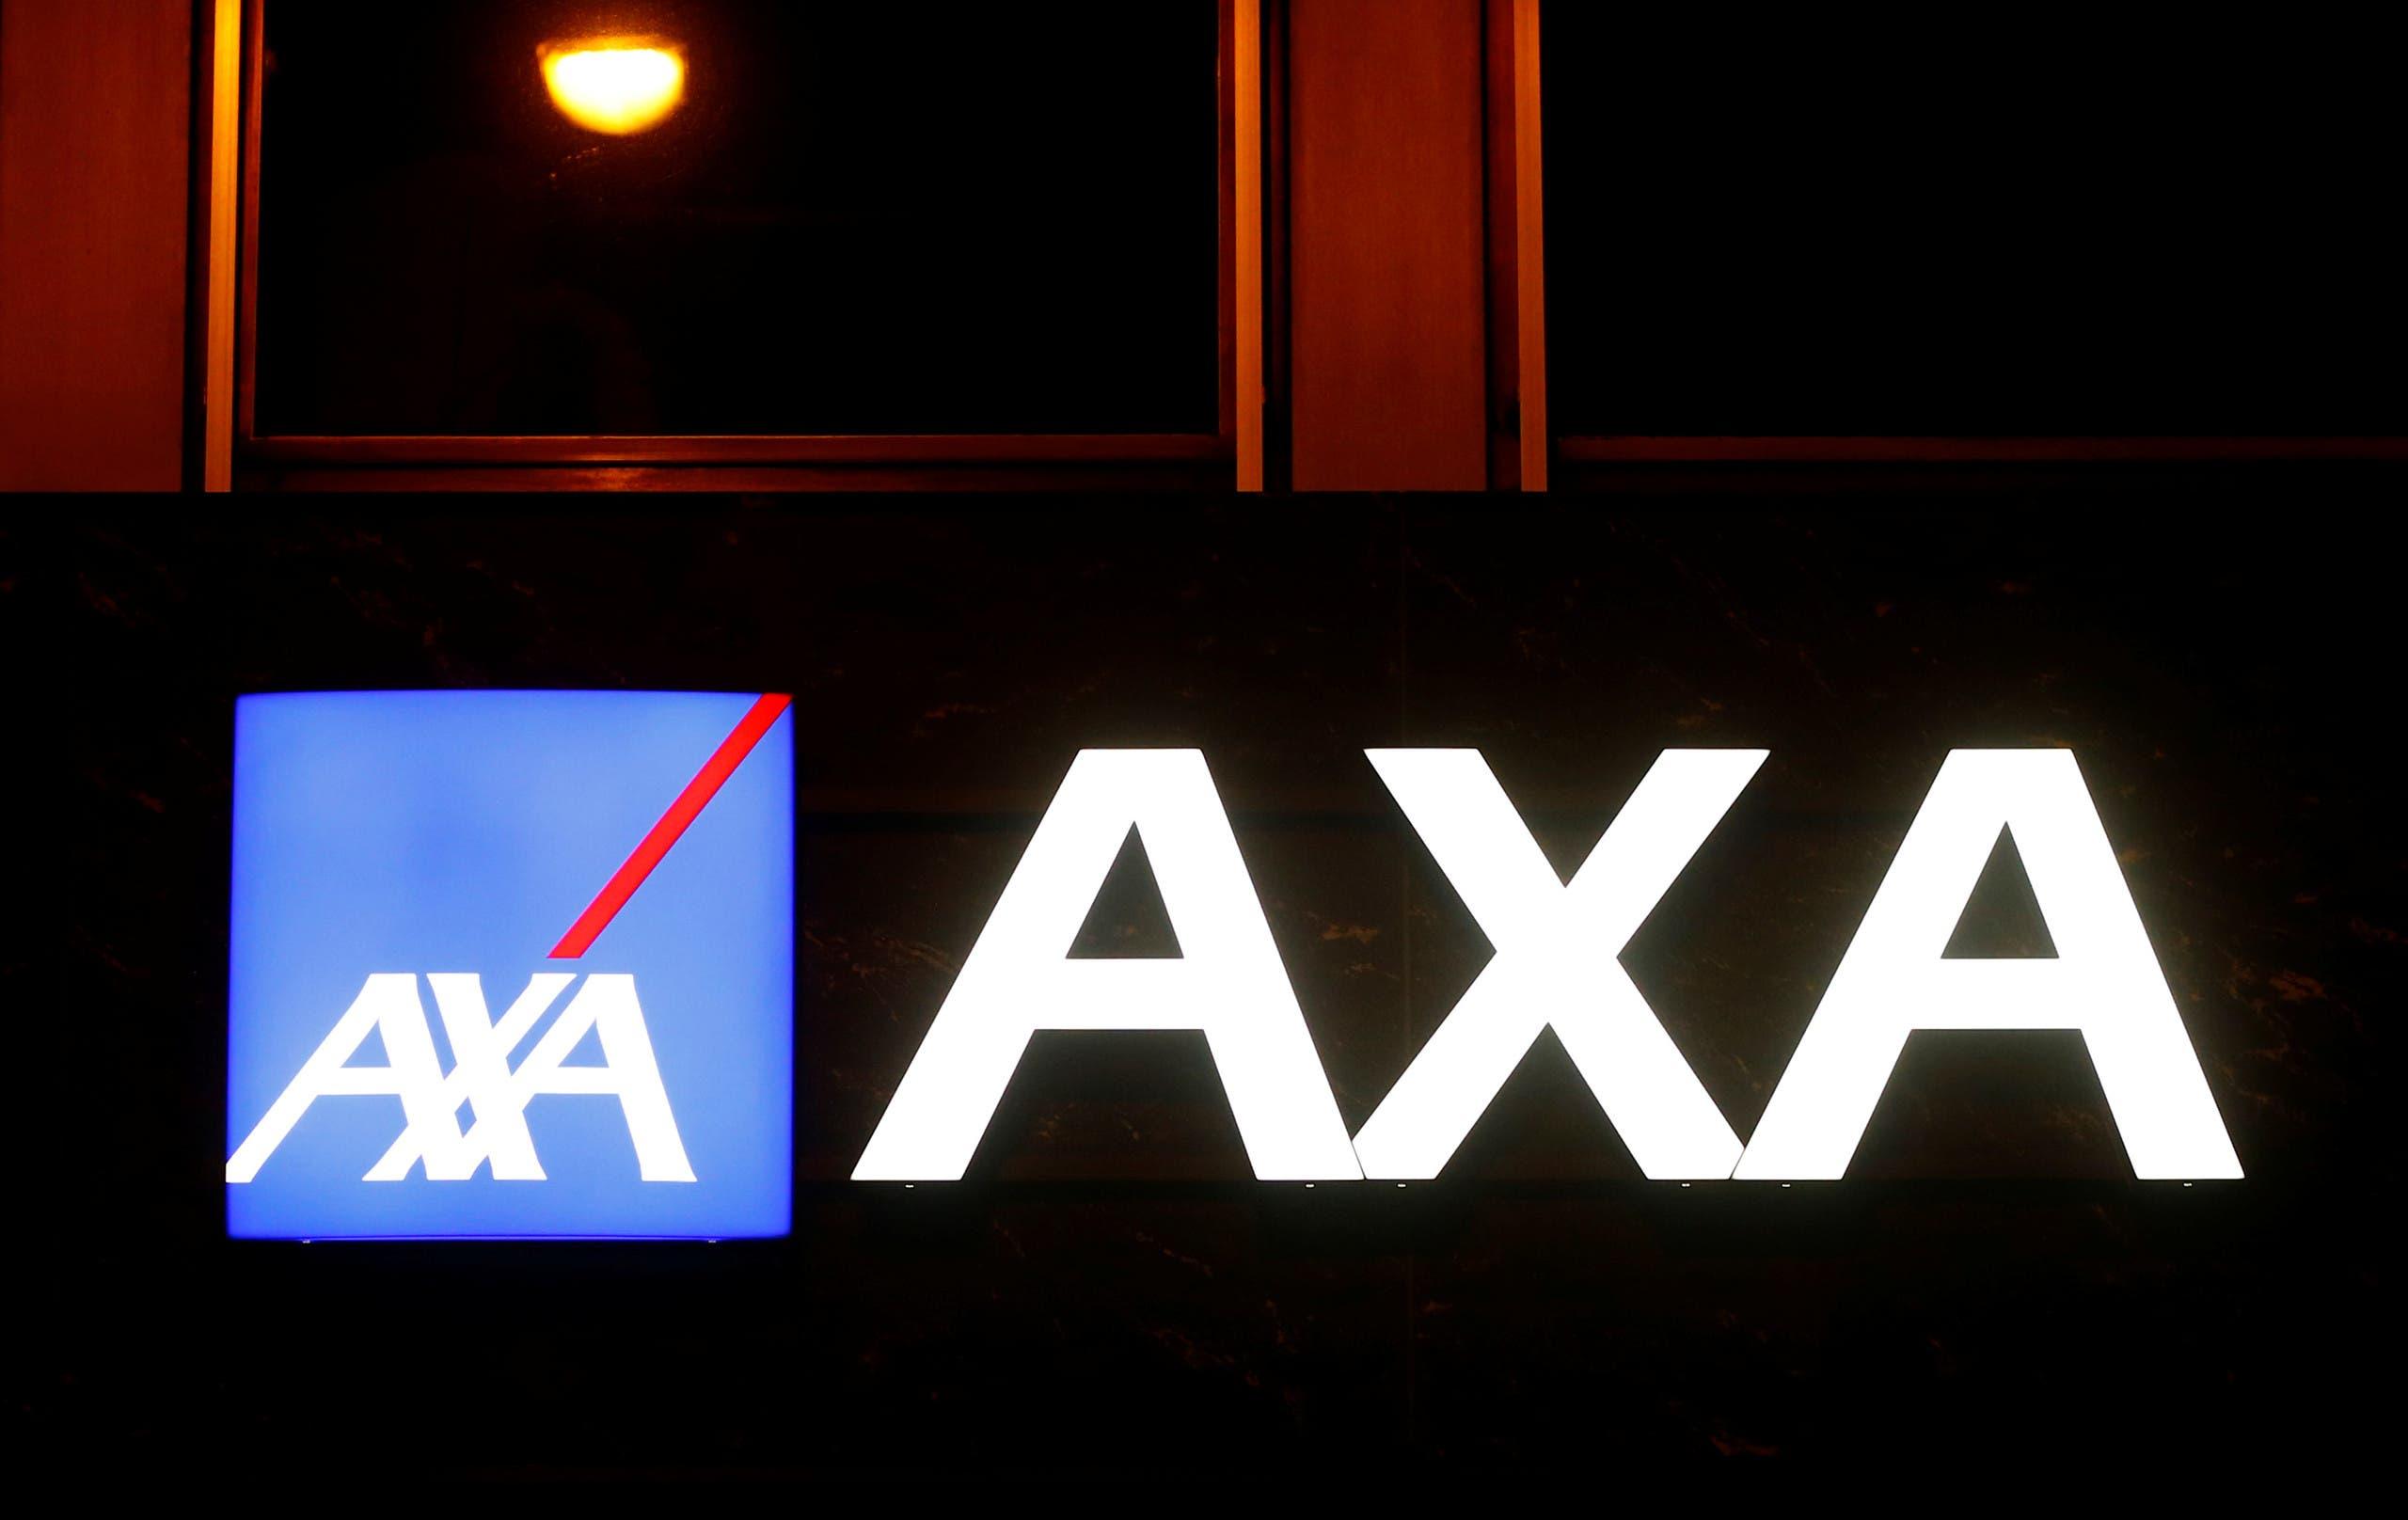 The logo of AXA insurance. (File photo: Reuters)